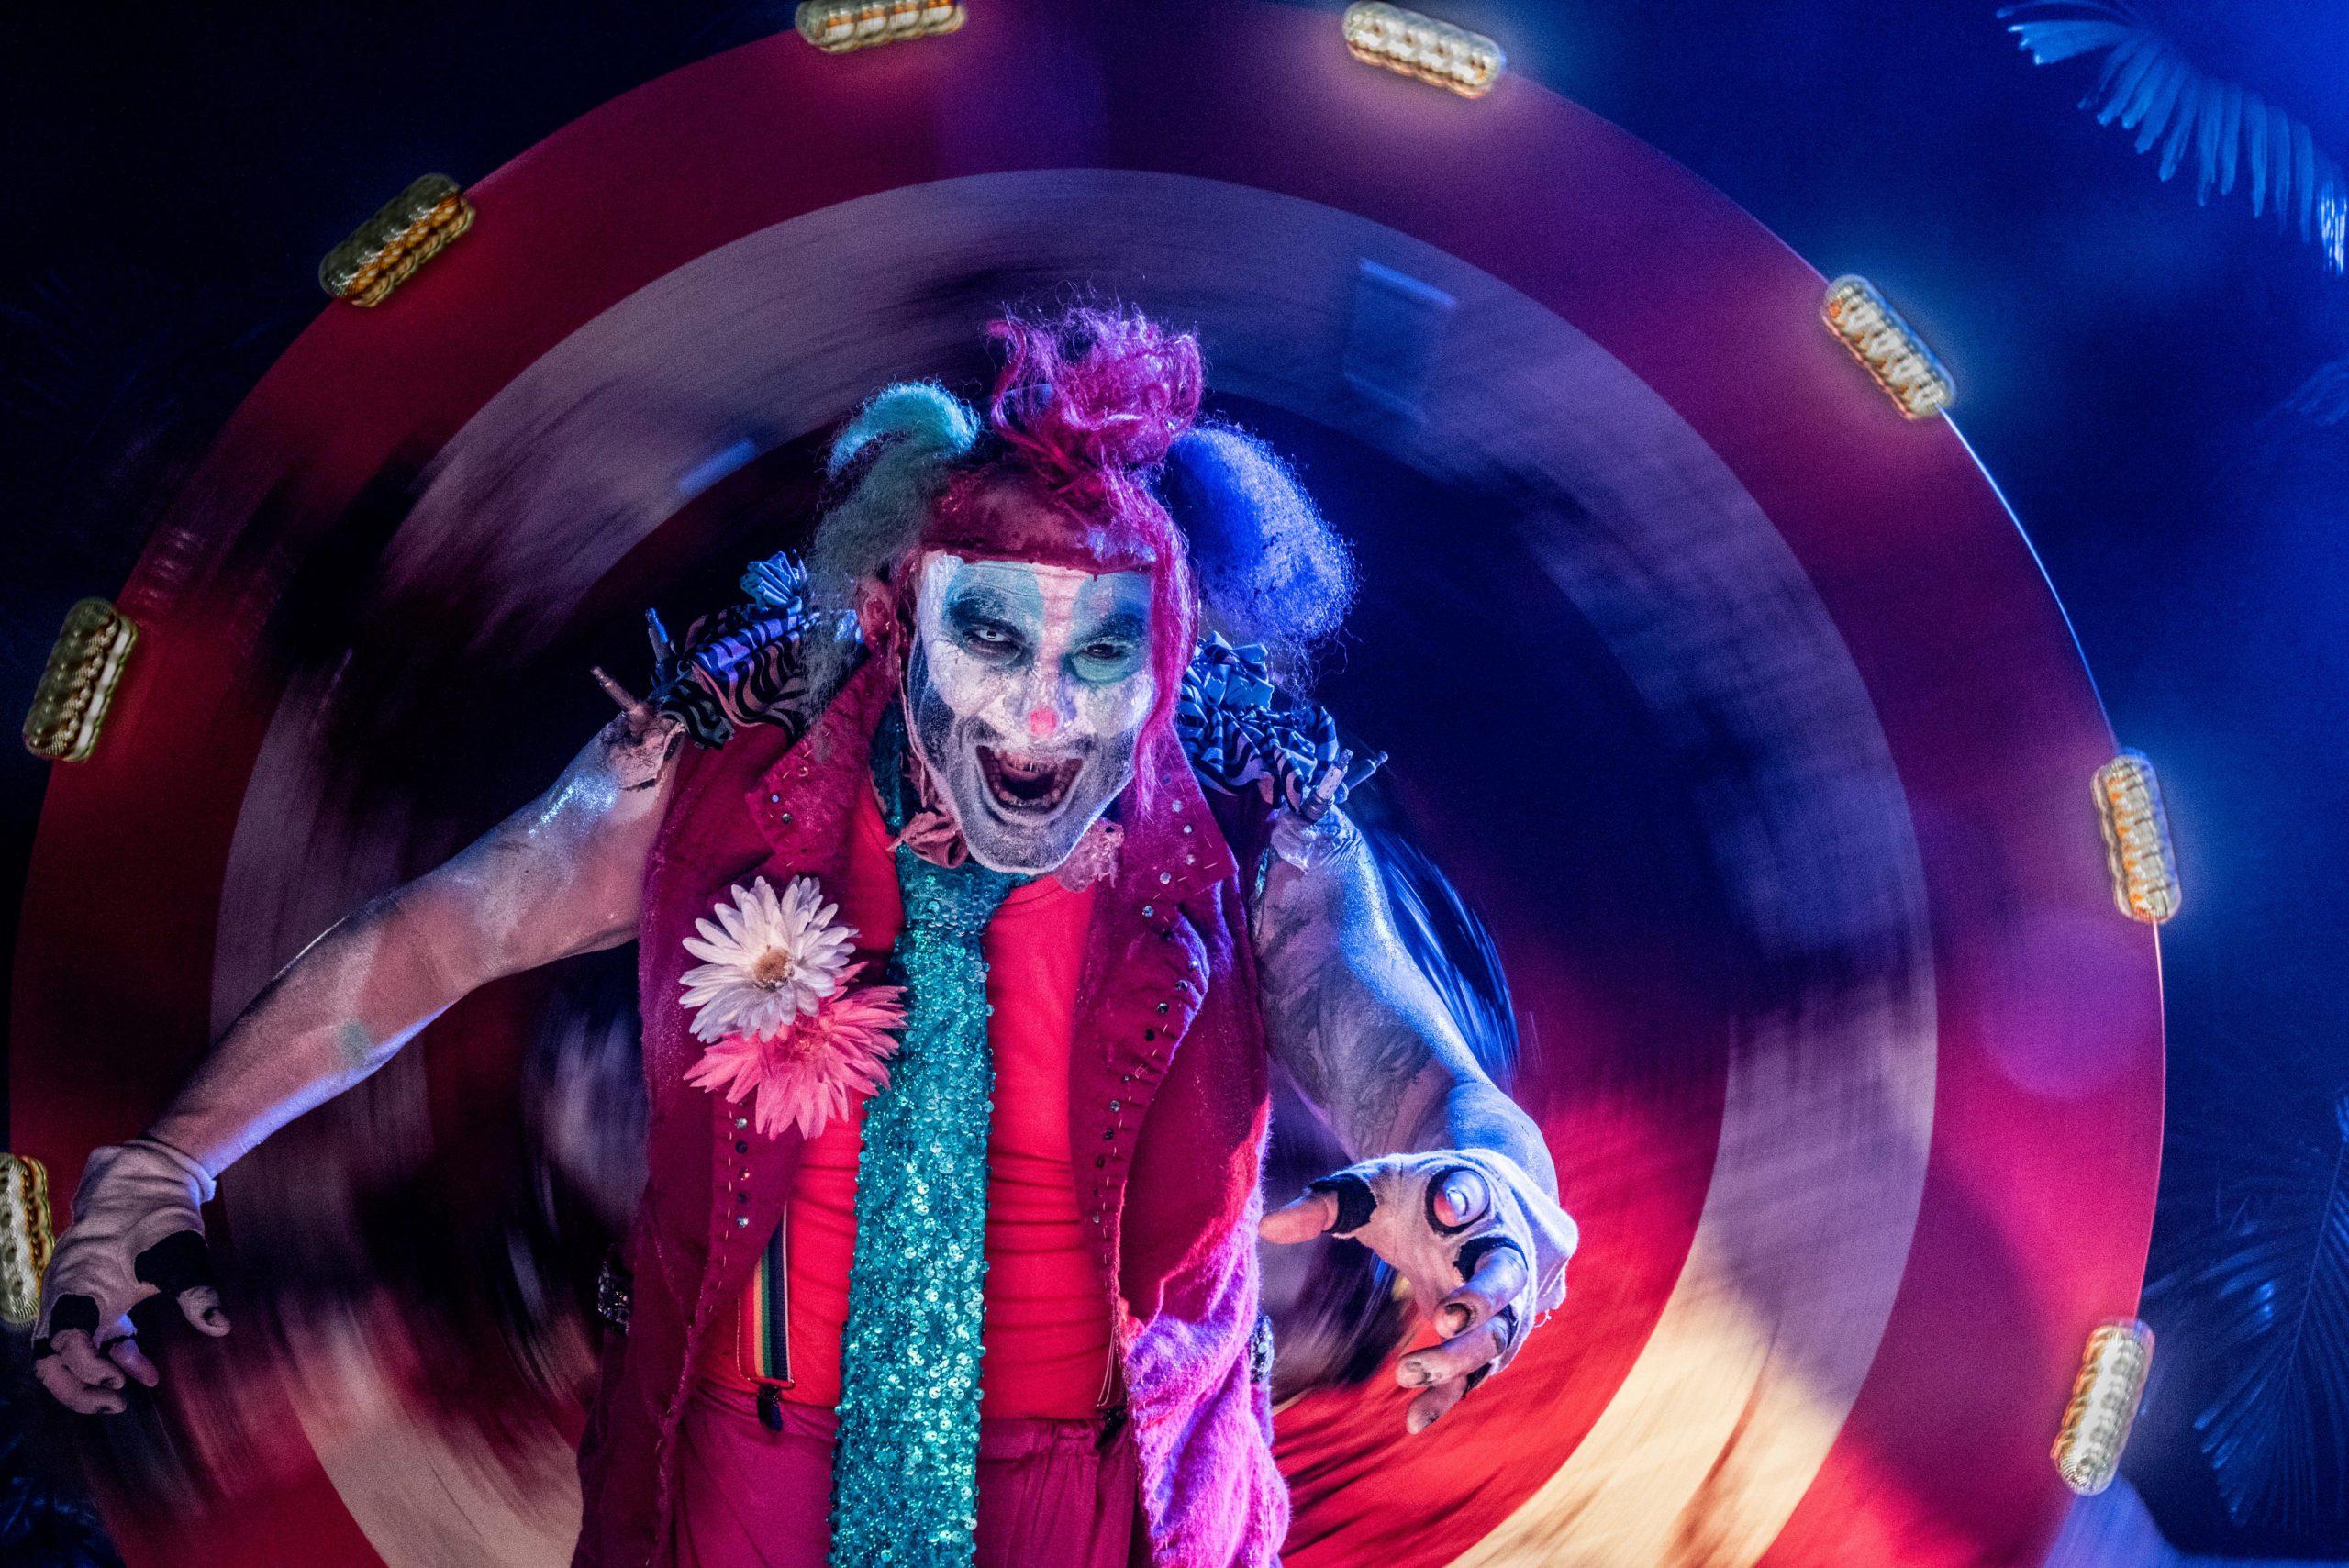 Splats the clown at Howl-o-scream Sea World San Diego